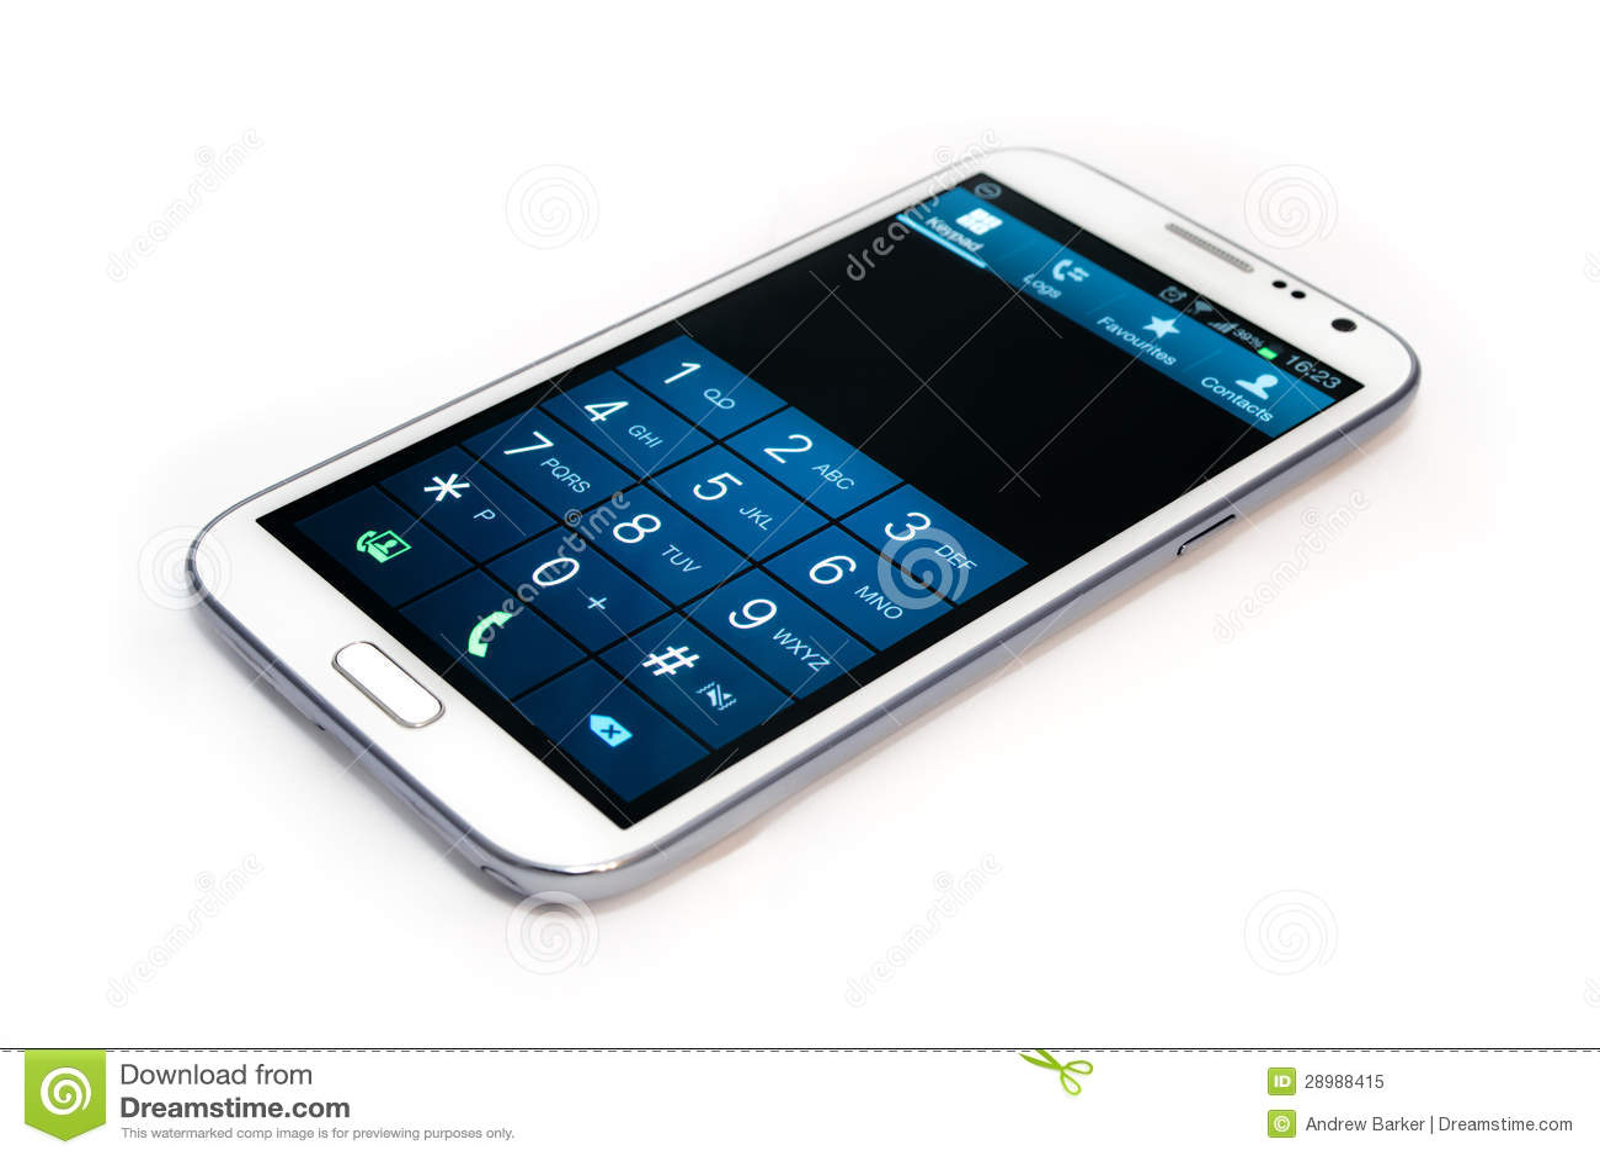 mobile telephone royalty free stock photo image 28988415. Black Bedroom Furniture Sets. Home Design Ideas